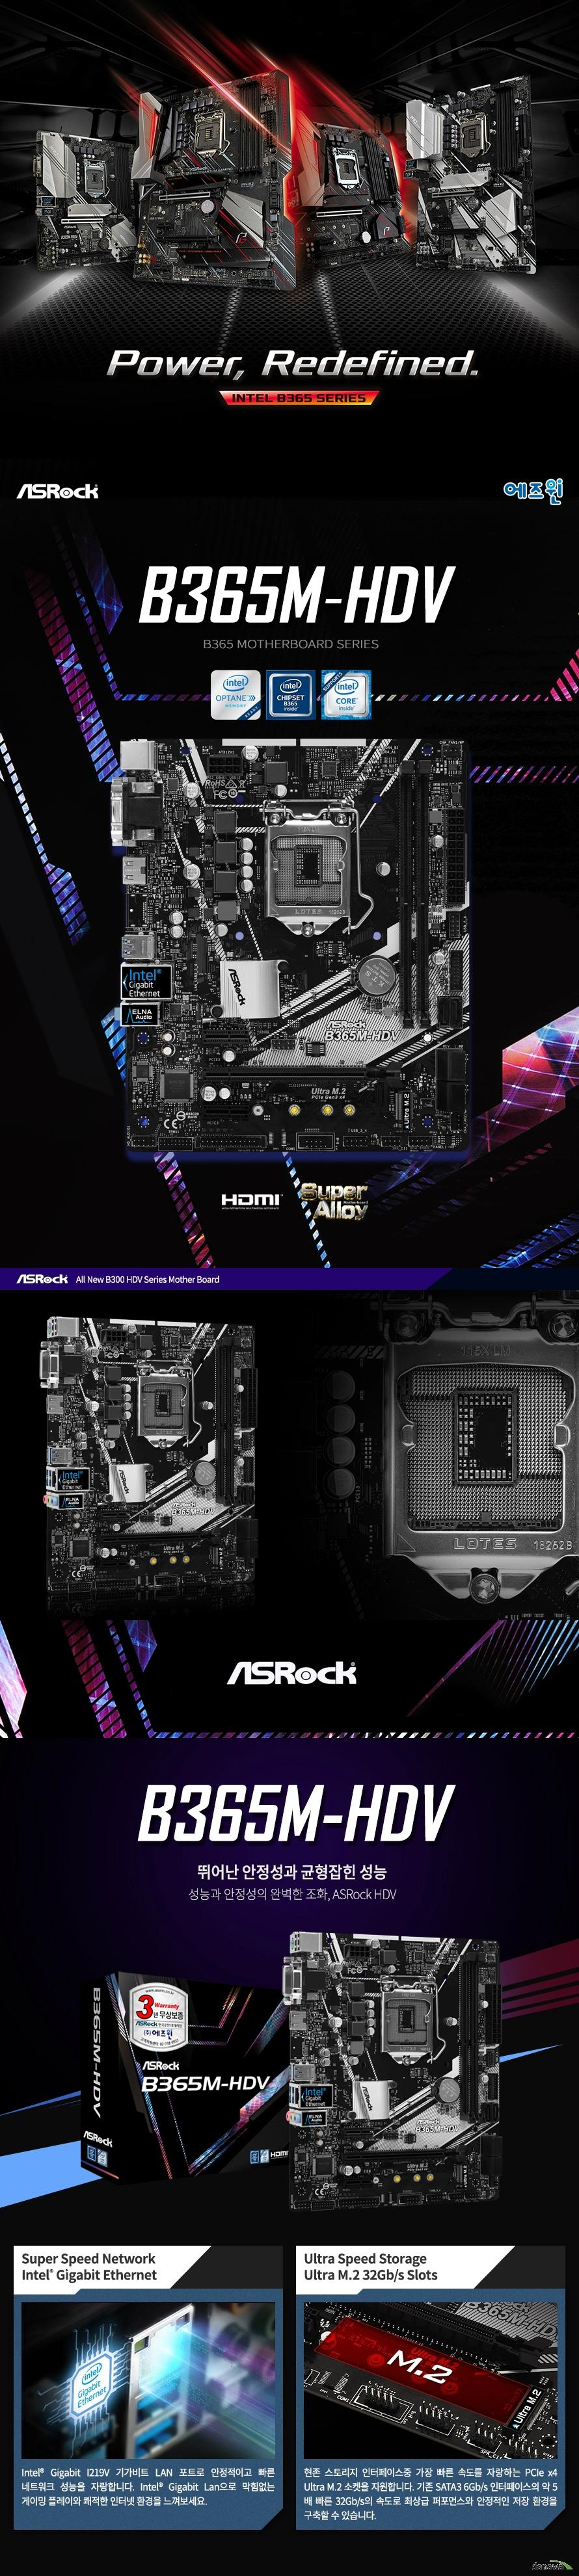 ASRock B365M HDV 에즈윈  9세대 및 8세대 인텔 프로세서 지원 LGA1151소켓 최대 95와트 cpu 지원 인텔 터보 부스트 테크놀로지 2.0 지원  인텔 B365 칩셋 지원  듀얼채널 DDR4 DIMM 메모리 지원 최대 64GB 메모리 지원 DDR4 2666 2400 2133 NON ECC UN BUFFERED 메모리 지원 ECC UDIMM 메모리 모듈 지원 XMP 2.0 지원  PCIE 3.0 X16 슬롯 1개  PCIE 3.0 X1 슬롯 2개 인텔 i219v 기가비트 랜 지원  SATA3 커넥터 6개 지원 울트라 m.2 슬롯 1개 지원  USB 3.1 GEN1 타입A 6개 USB 2.0 6개 지원  리얼텍 ALC887 7.1채널 HD 오디오 코덱 지원 윈도우 10 64비트 지원   KC인증 R R ASR B365MHDV  제조사의 사정에 따라 사전고지 없이 일부 제품사양이 변경될 수 있으며, 더 자세한 정보는 제조사 홈페이지 또는 제품 매뉴얼을 참고해주시기 바랍니다.  제품 구성   사용자 매뉴얼 드라이버 설치 cd m.2 고정나사 SATA3 케이블 IO쉴드  최고의 고객 만족을 위하여 에즈윈 에서는 3년 무상 품질 보증 서비스를 제공합니다.